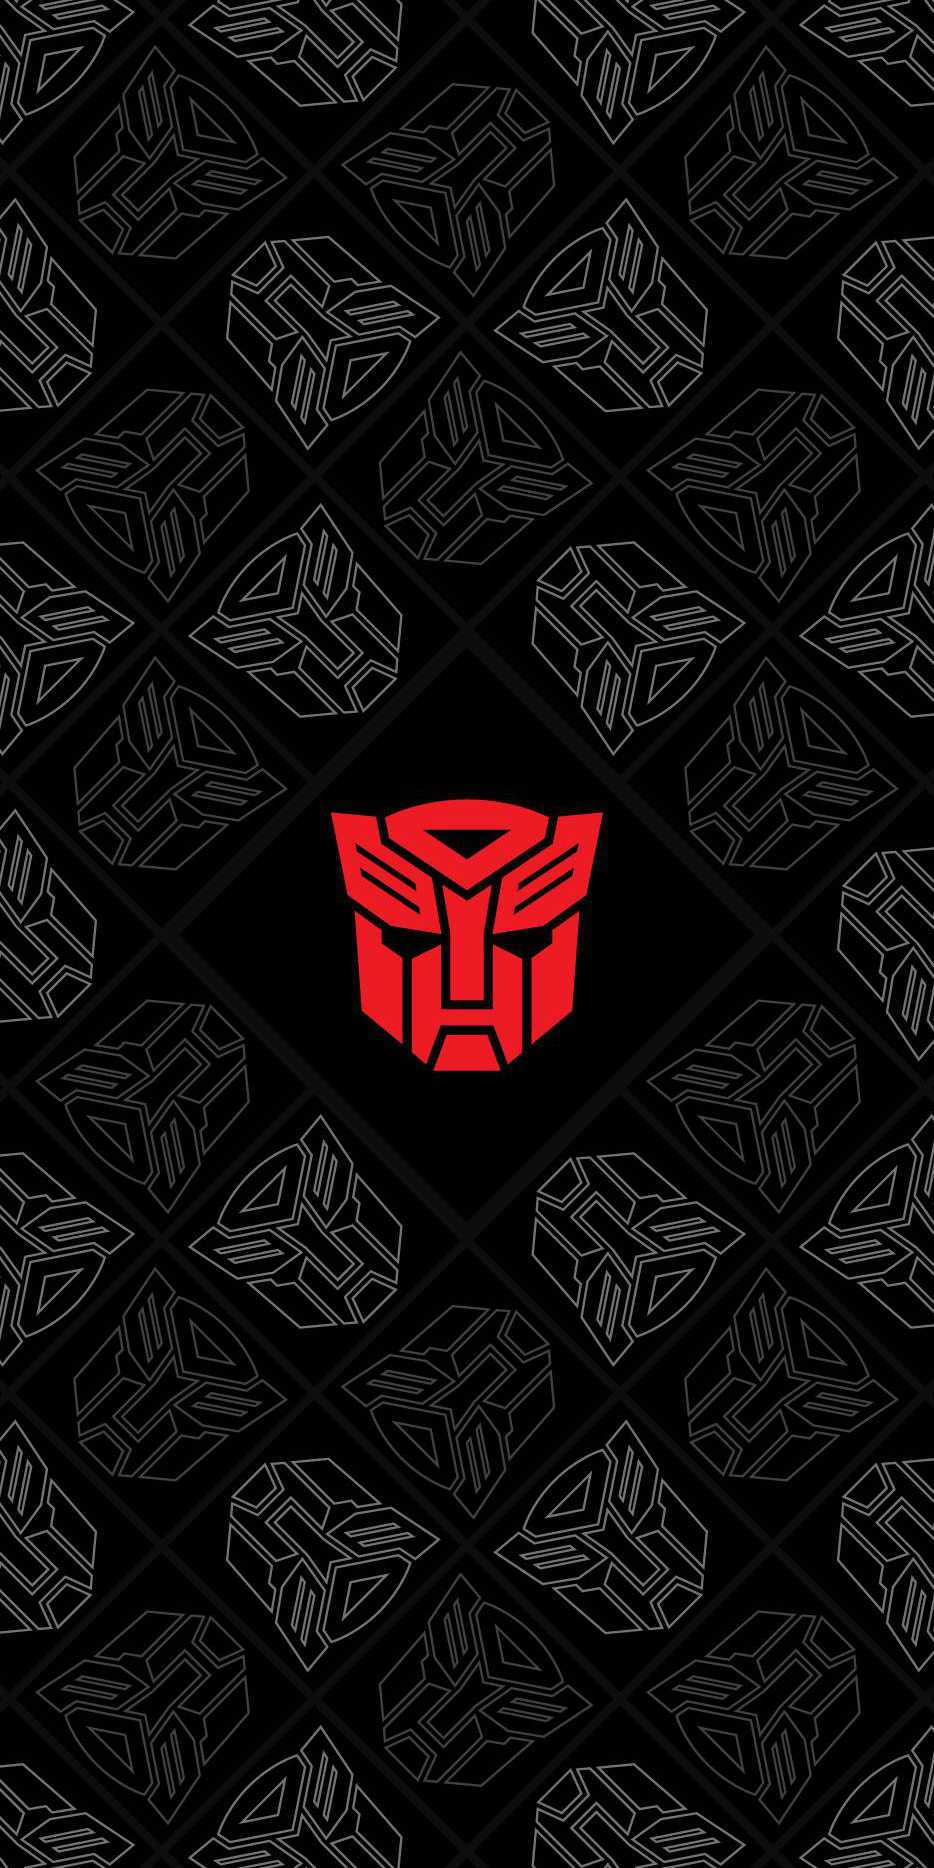 Transformers Autobots Logo iPhone Wallpaper